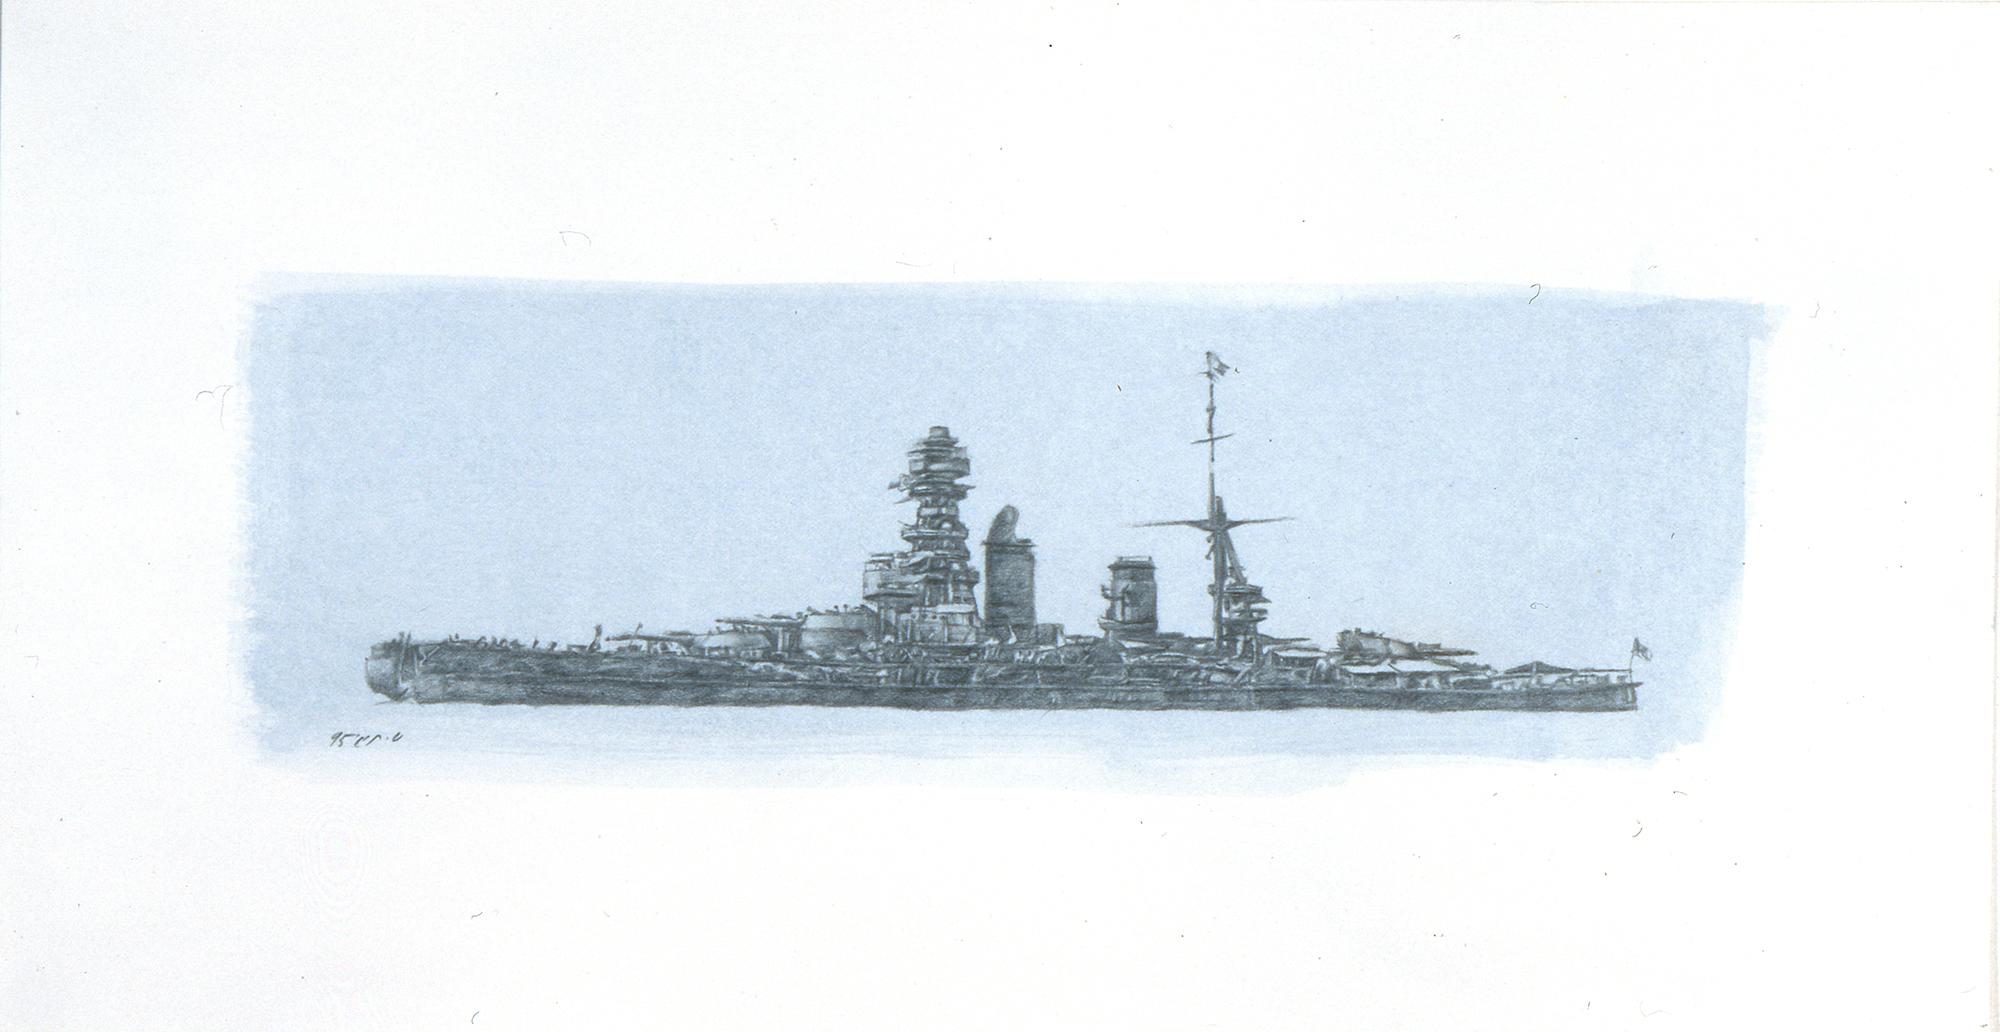 Battleship 3